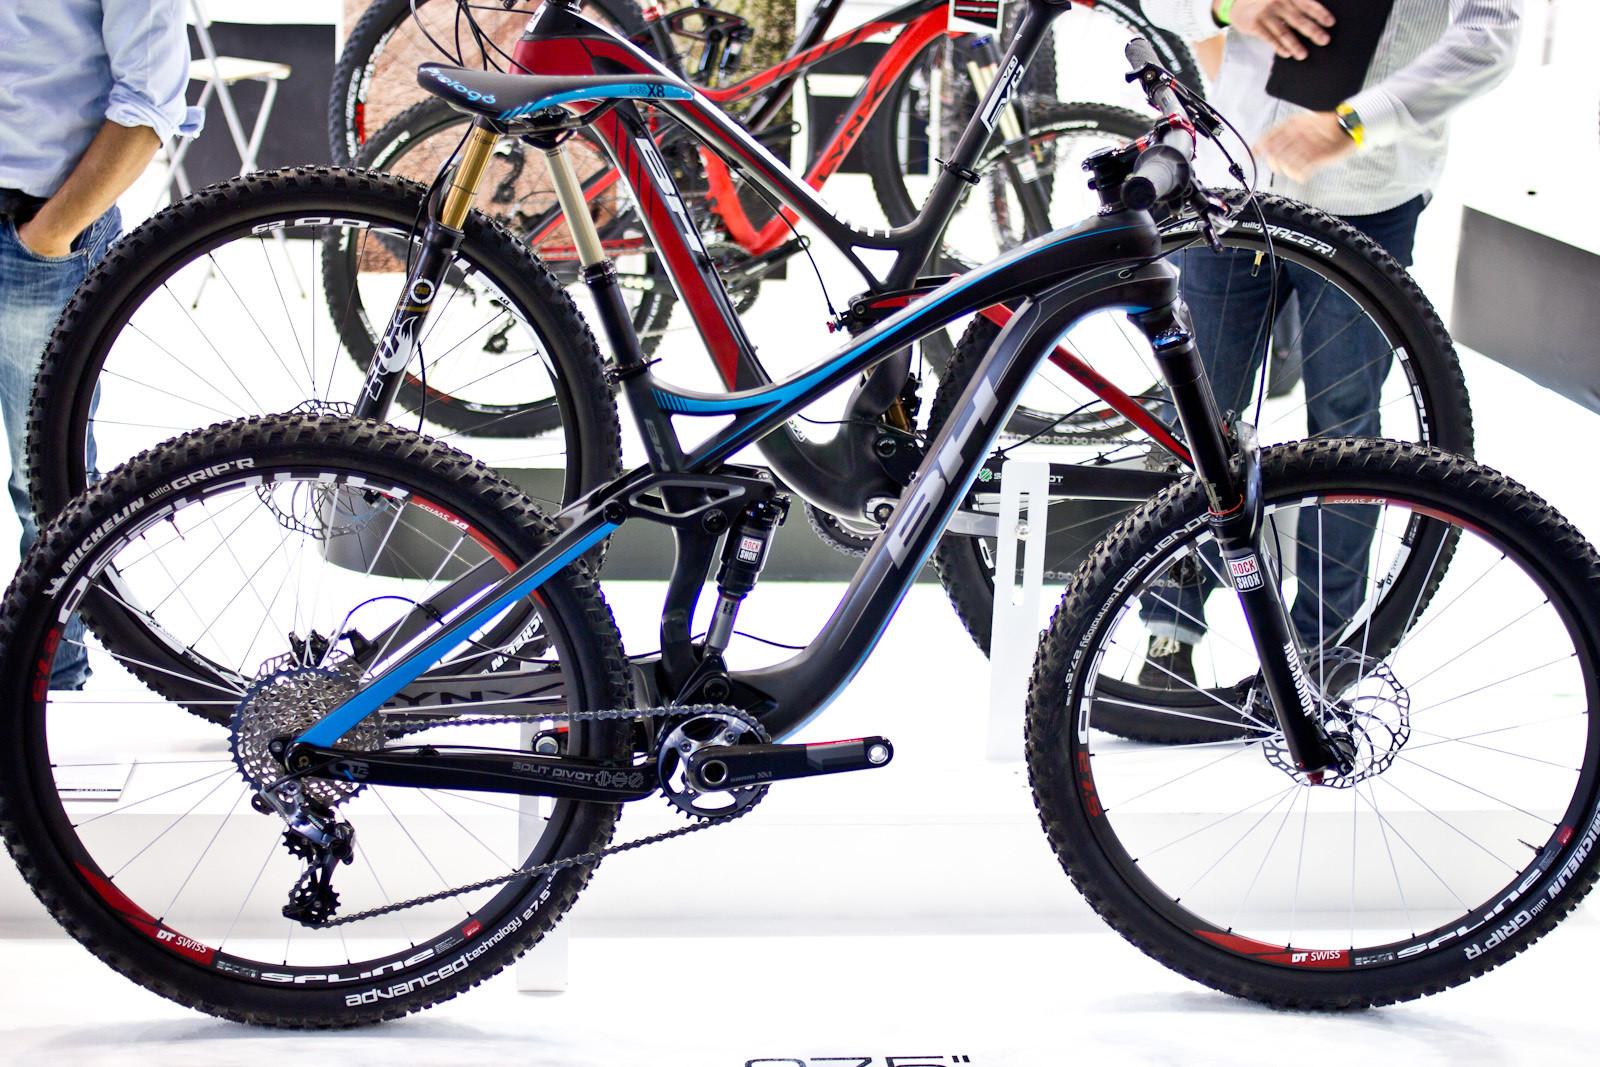 2014 BH Lynx 6 27.5 Carbon - 2014 Trail, All-Mountain & Enduro Bikes at Eurobike 2013 - Mountain Biking Pictures - Vital MTB